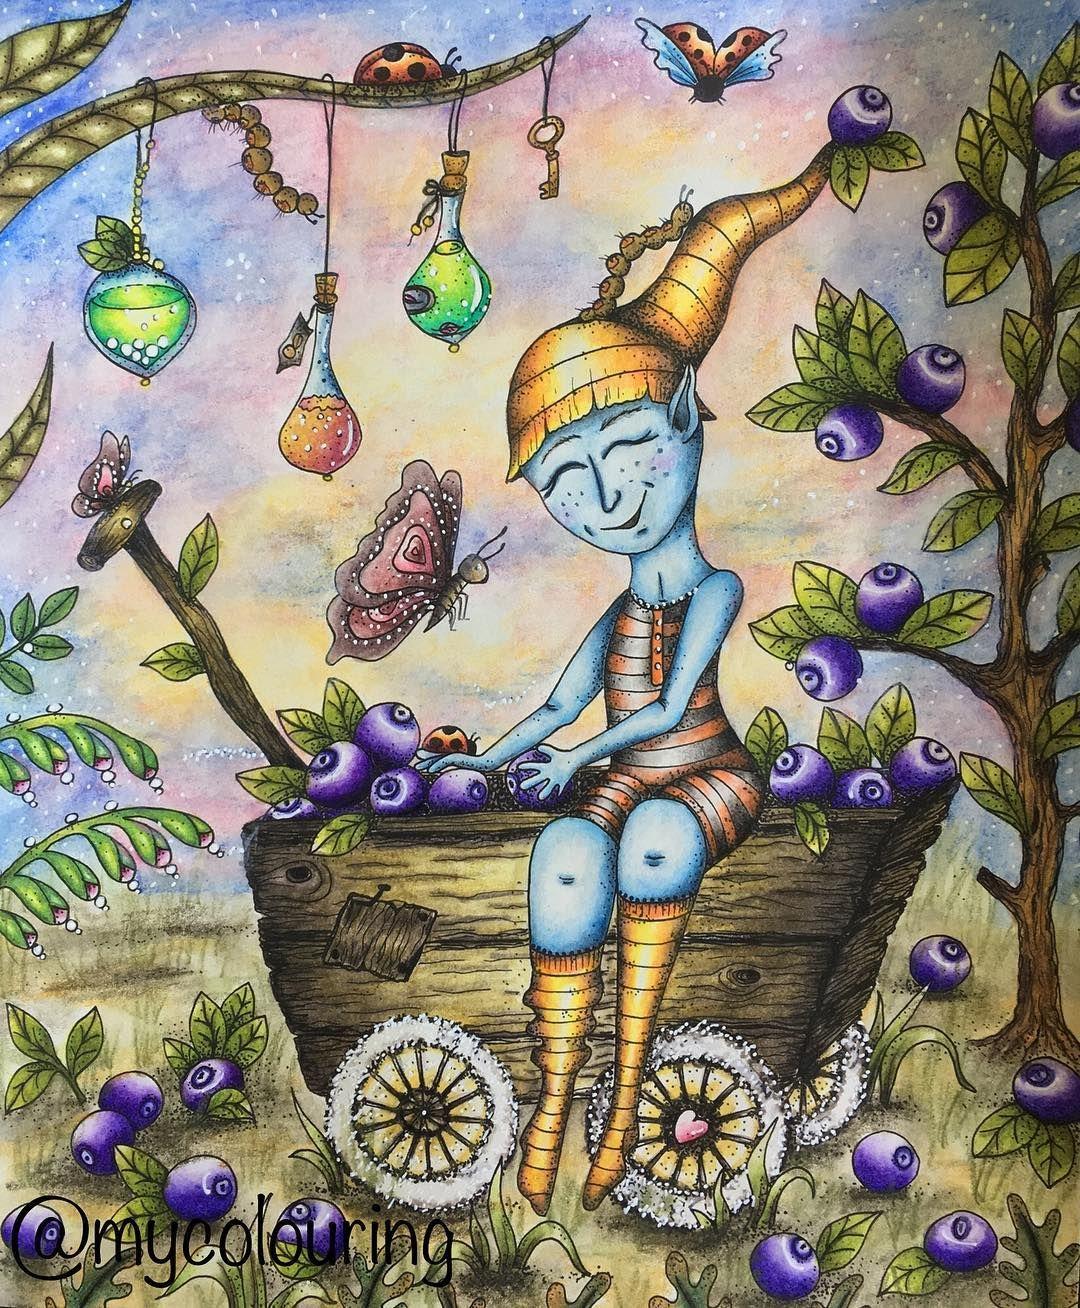 Such A Cute Pic Dw Inktense And Neocolor 2 For The Background Klaramarkova Klaramarkovajewels Carovnelahodnosti Magicaldelights Art Pics Coloring Books